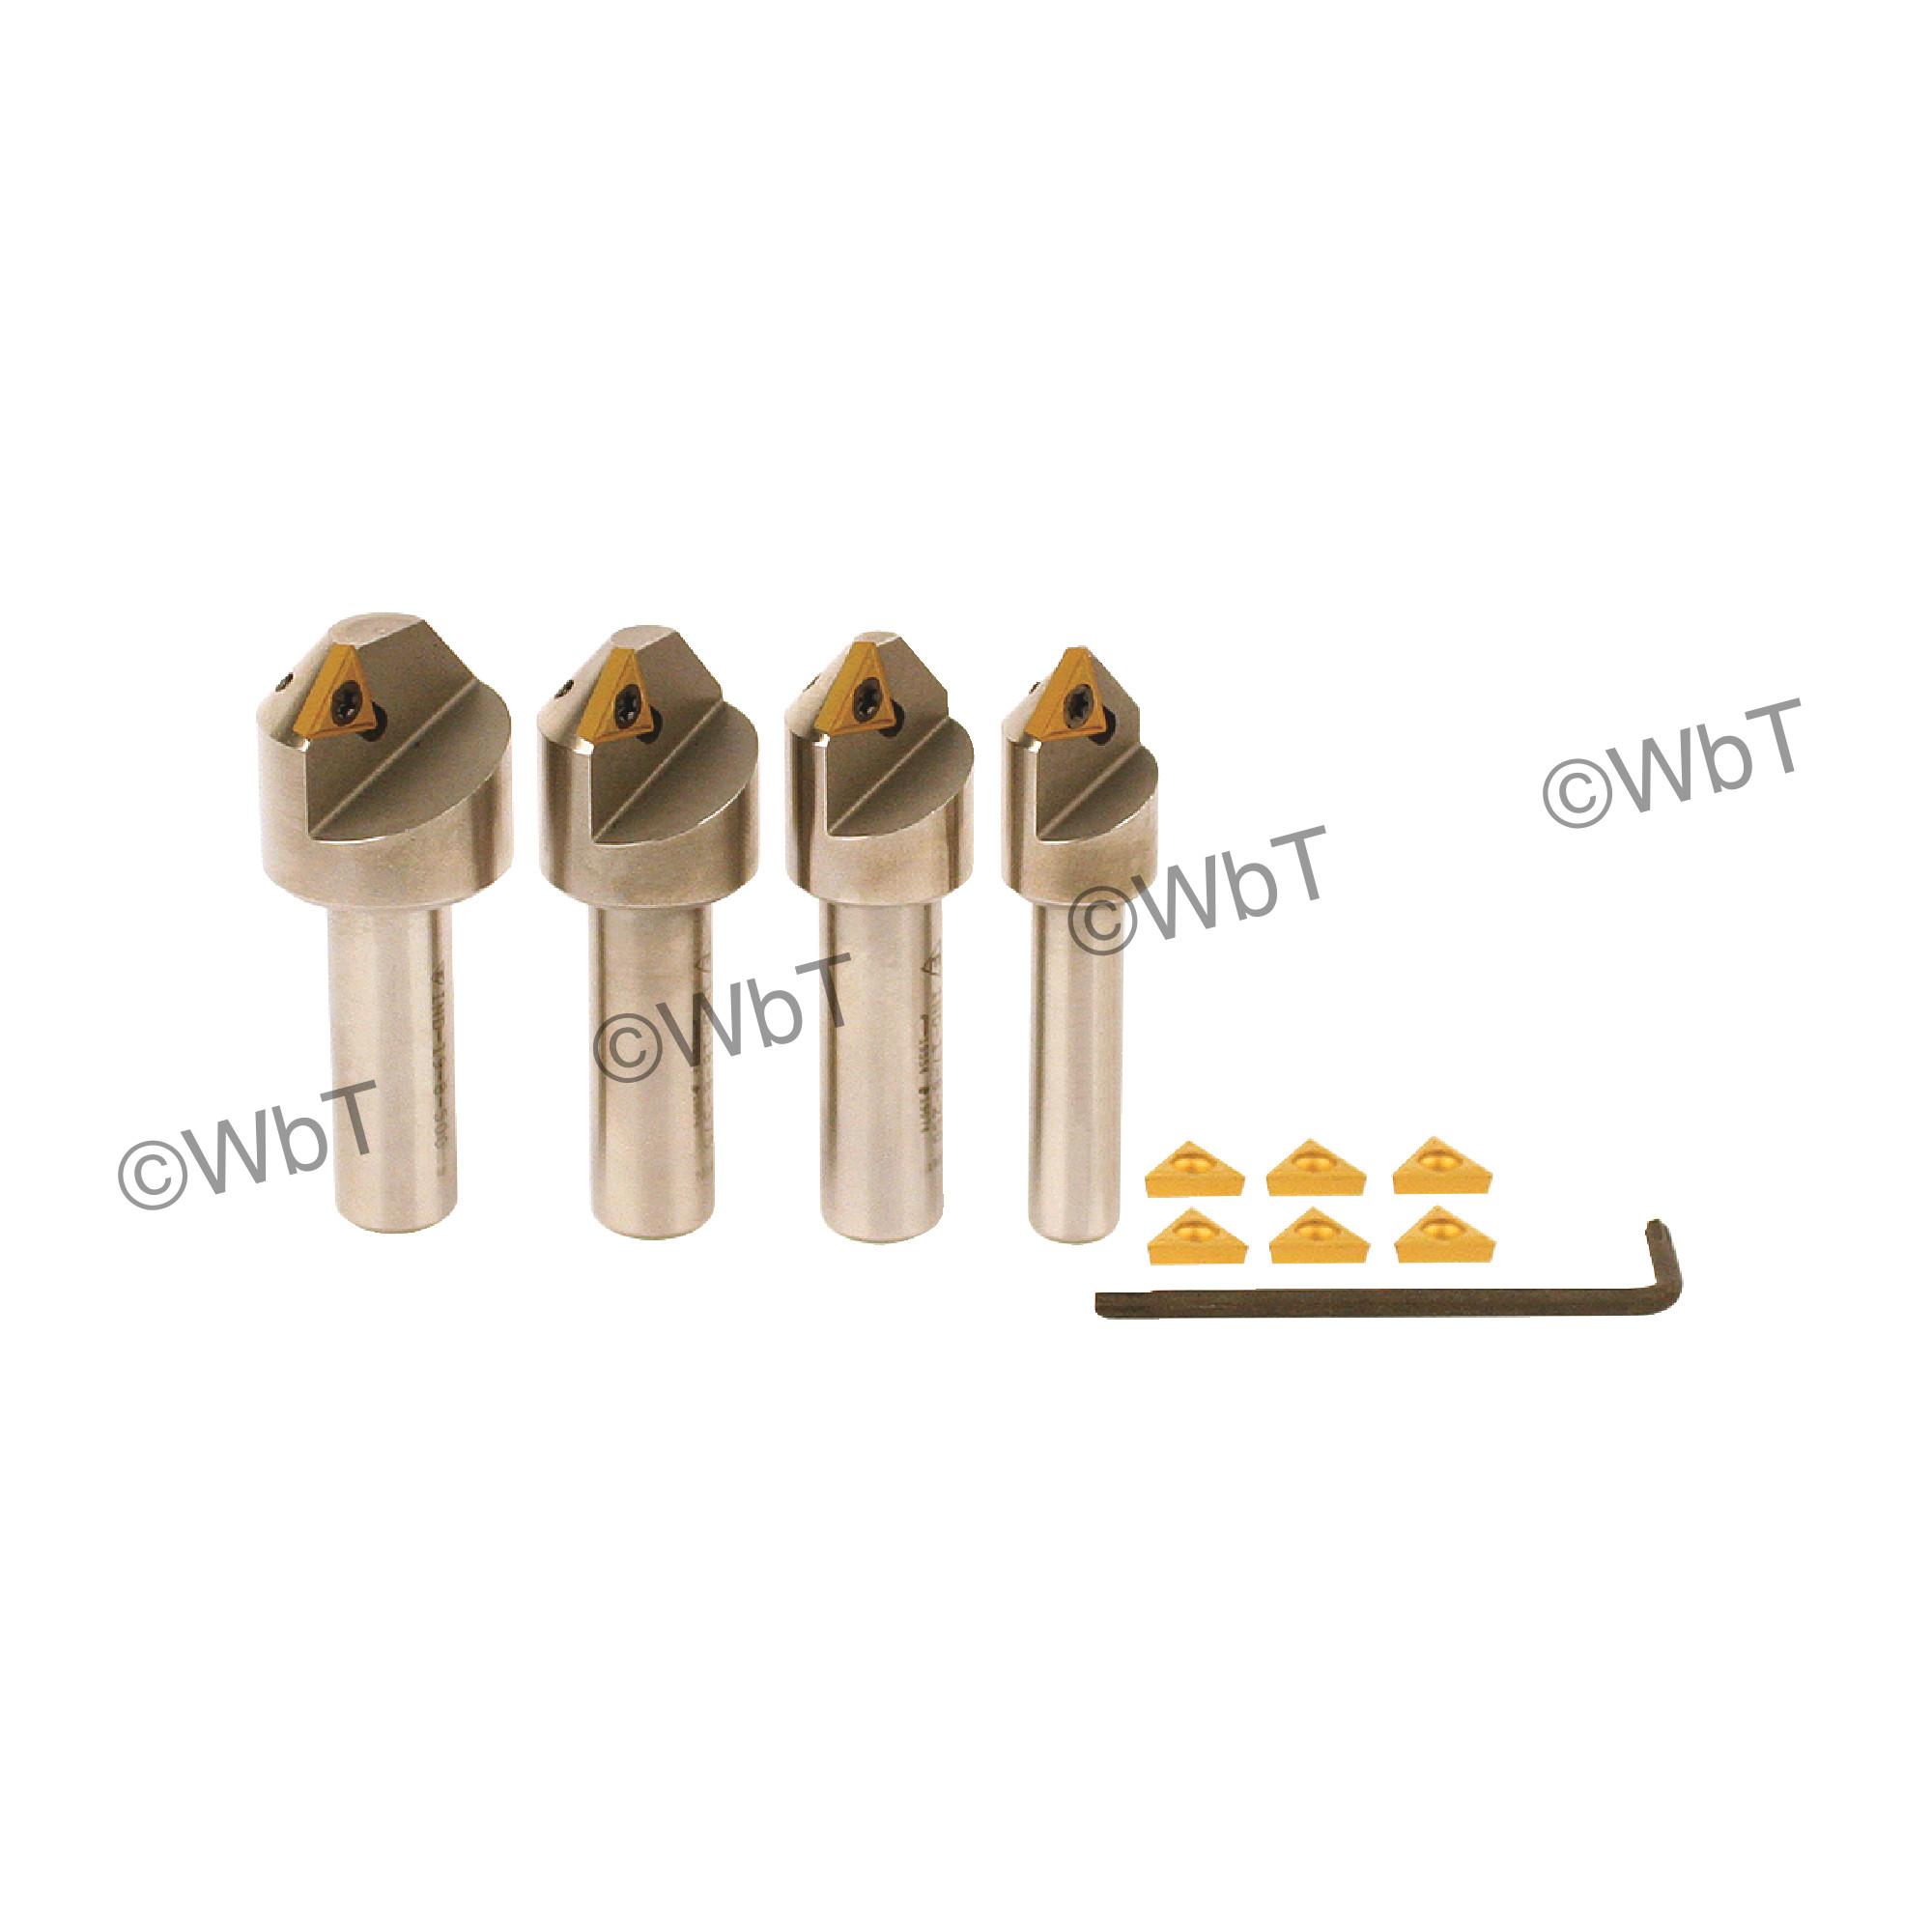 EVEREDE - Set 82 - 82° 4 Piece Countersink Set / (10) TPGH215 CV6 Coated Inserts